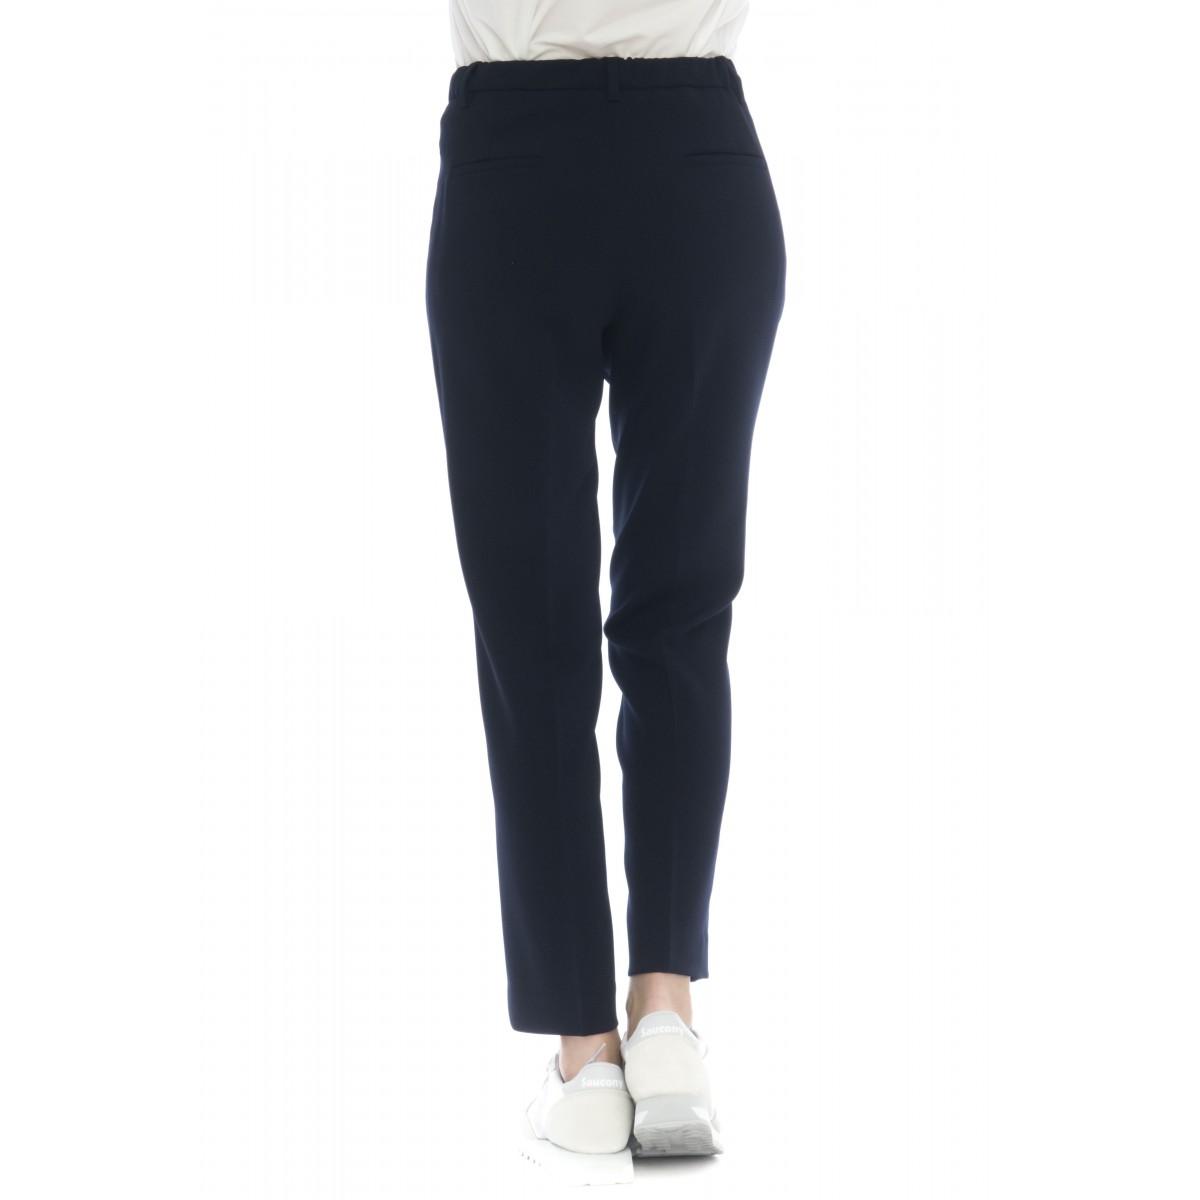 Pantalone donna - 172659 d9424 galene